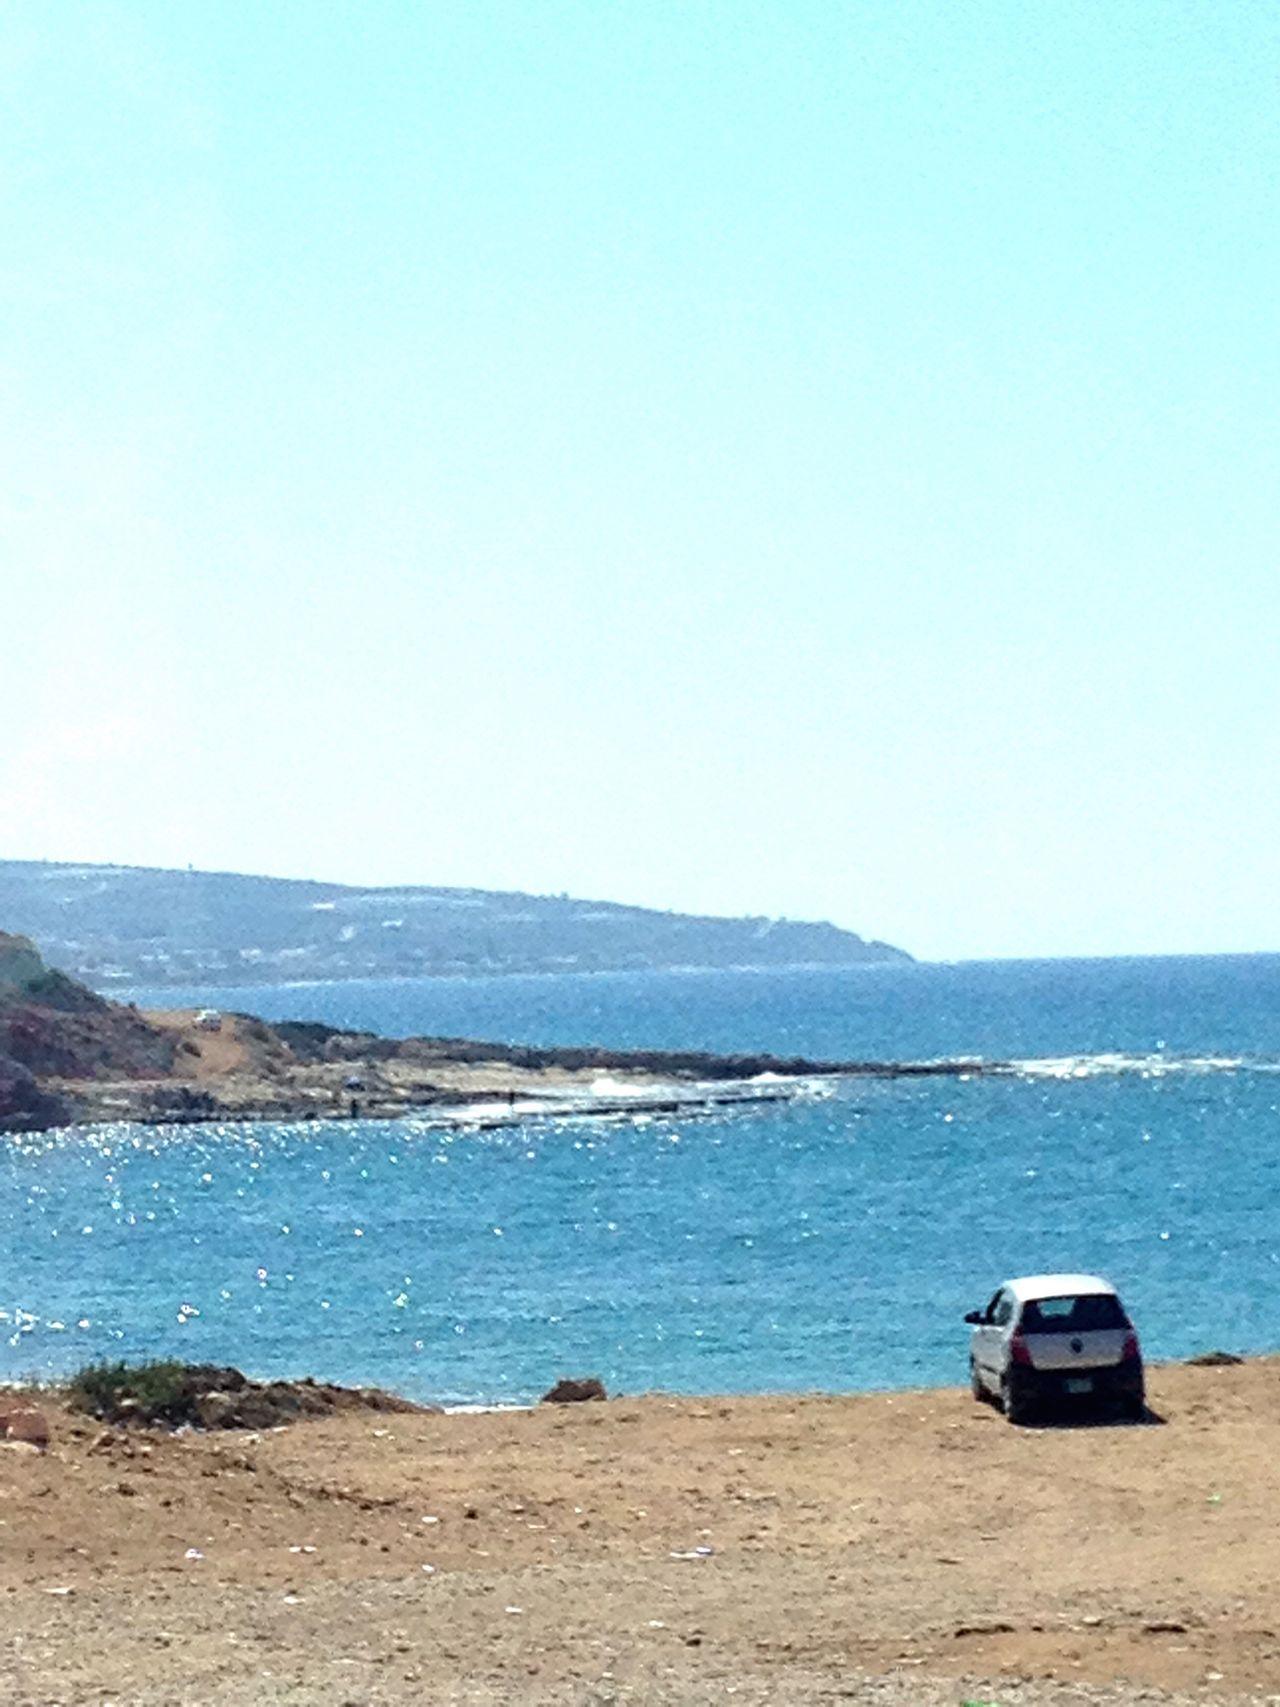 Bayyada Mediterranean Sea Blue South Lebanon Lebanon East Mediterranean Man And Nature